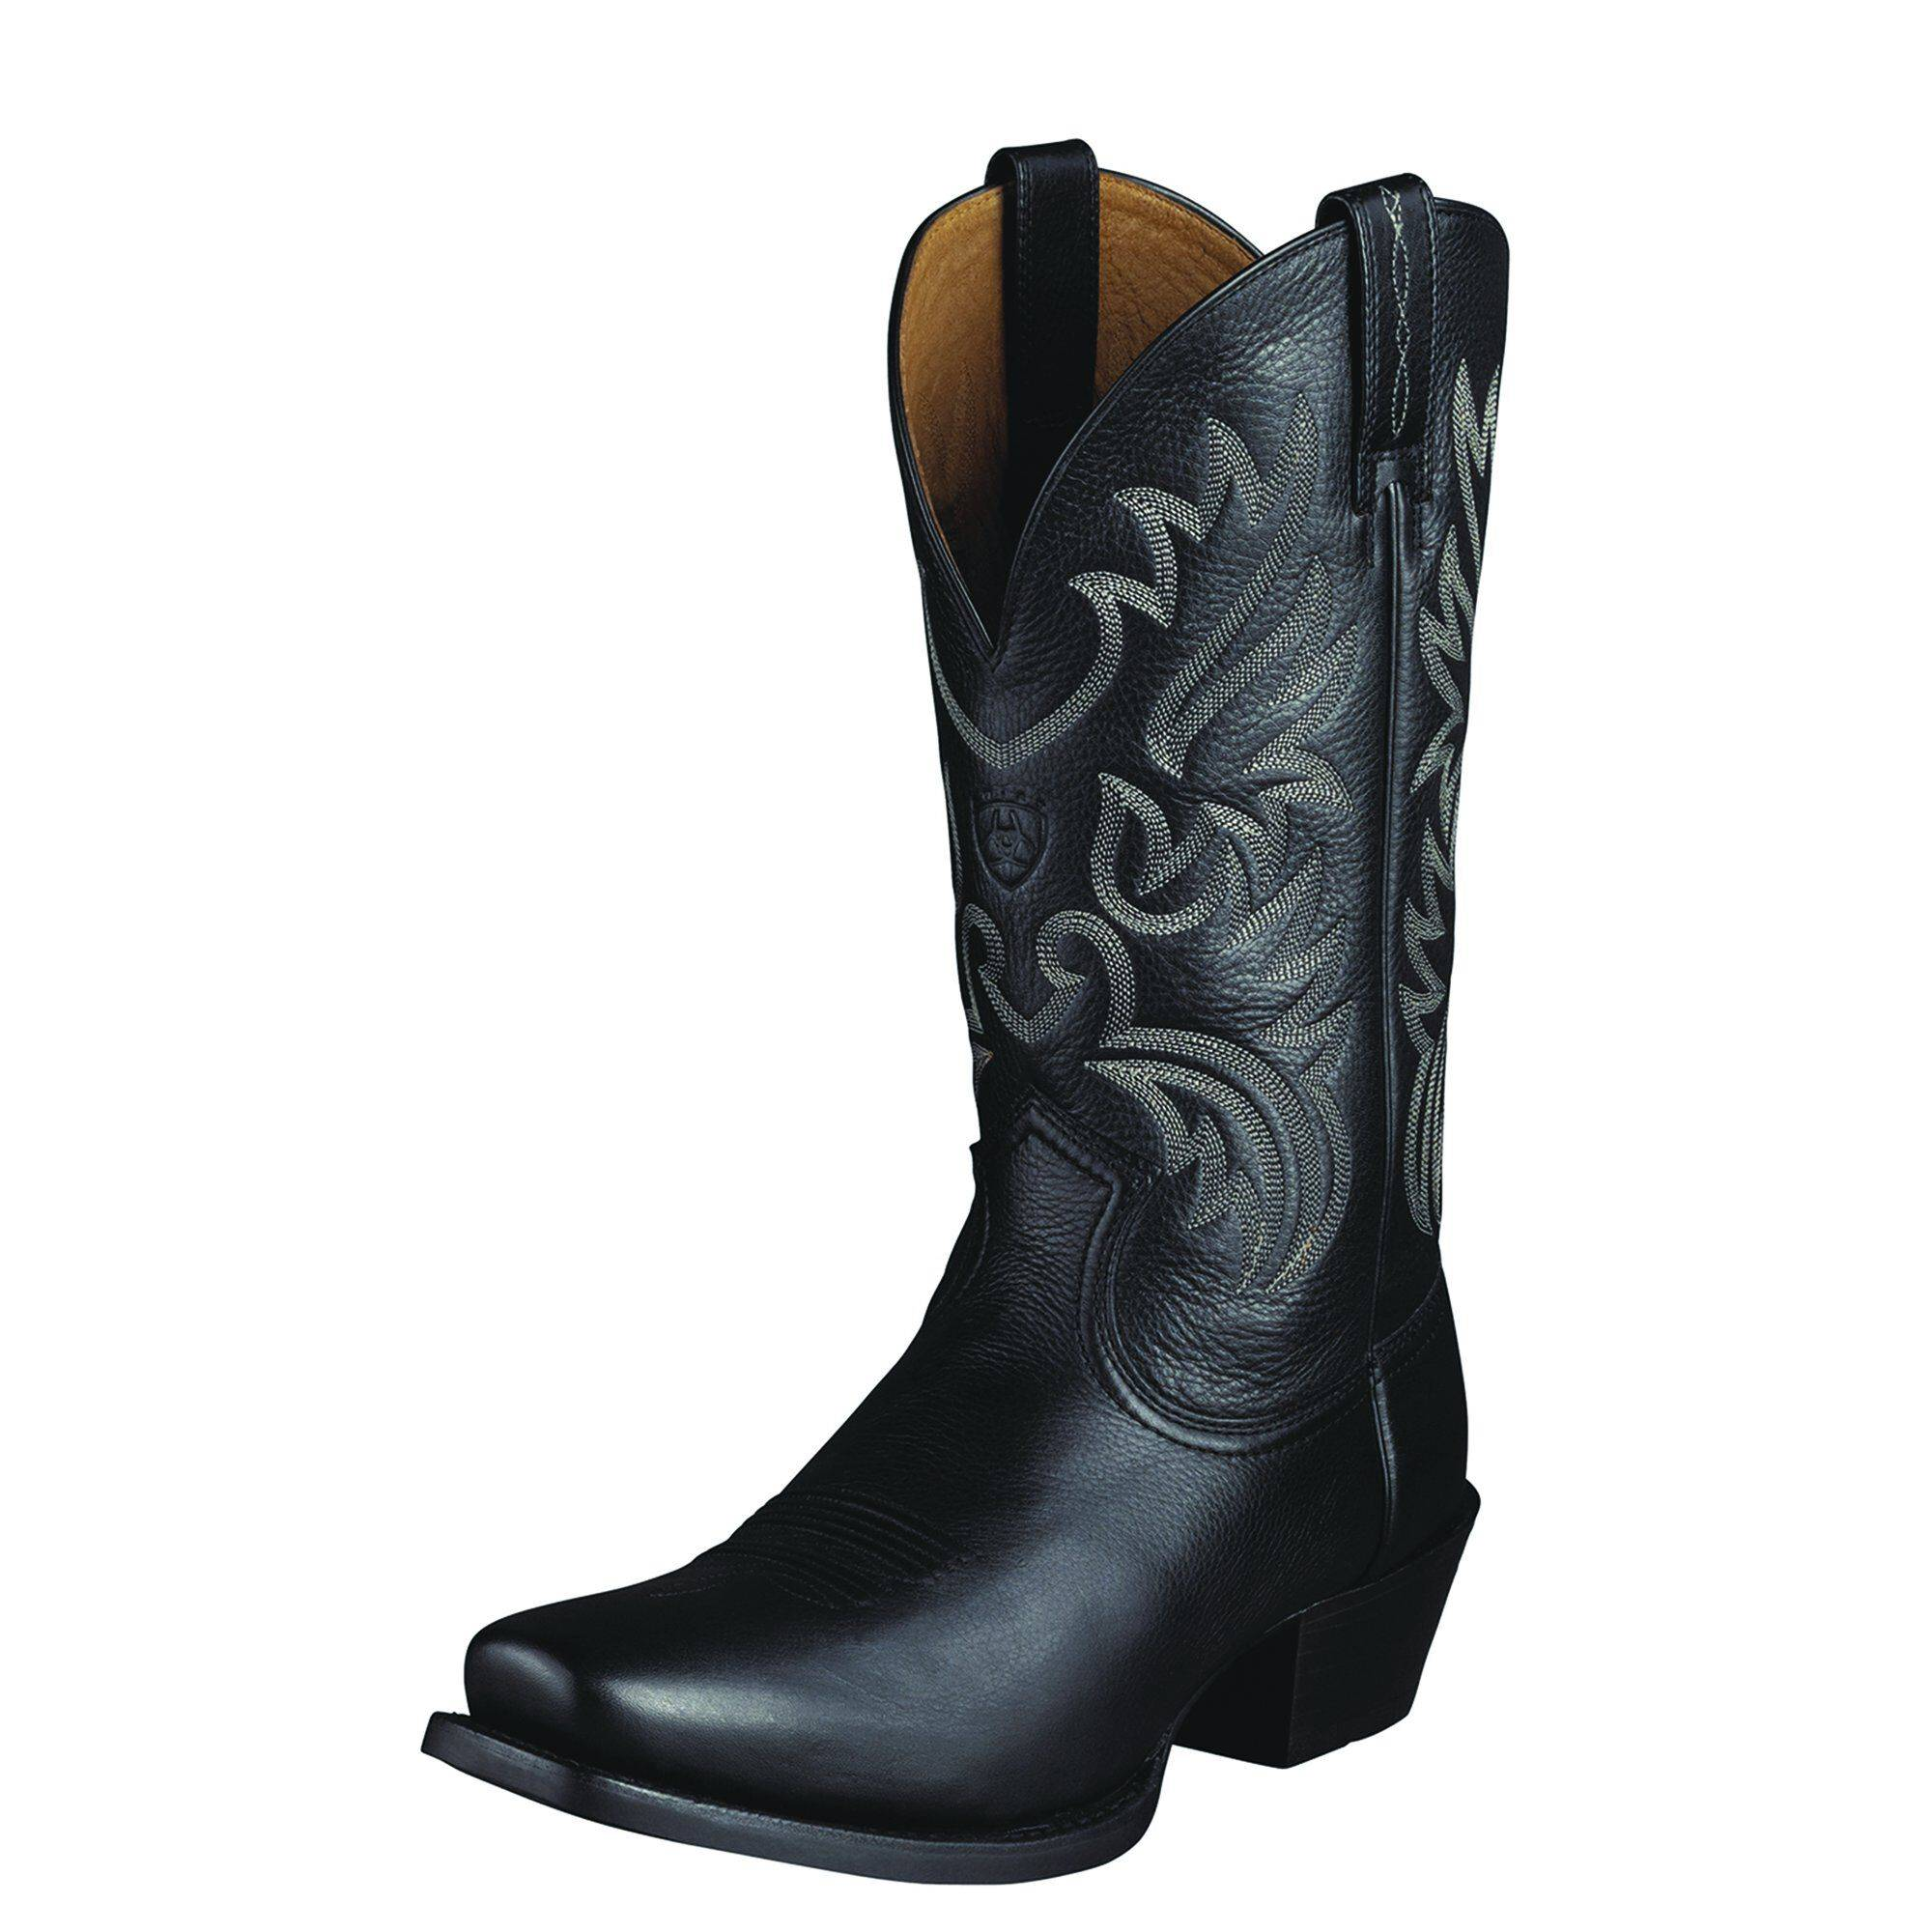 Ariat Men's Legend Western Boots in Black Deertan Leather, Size 9.5 EE / Wide by Ariat